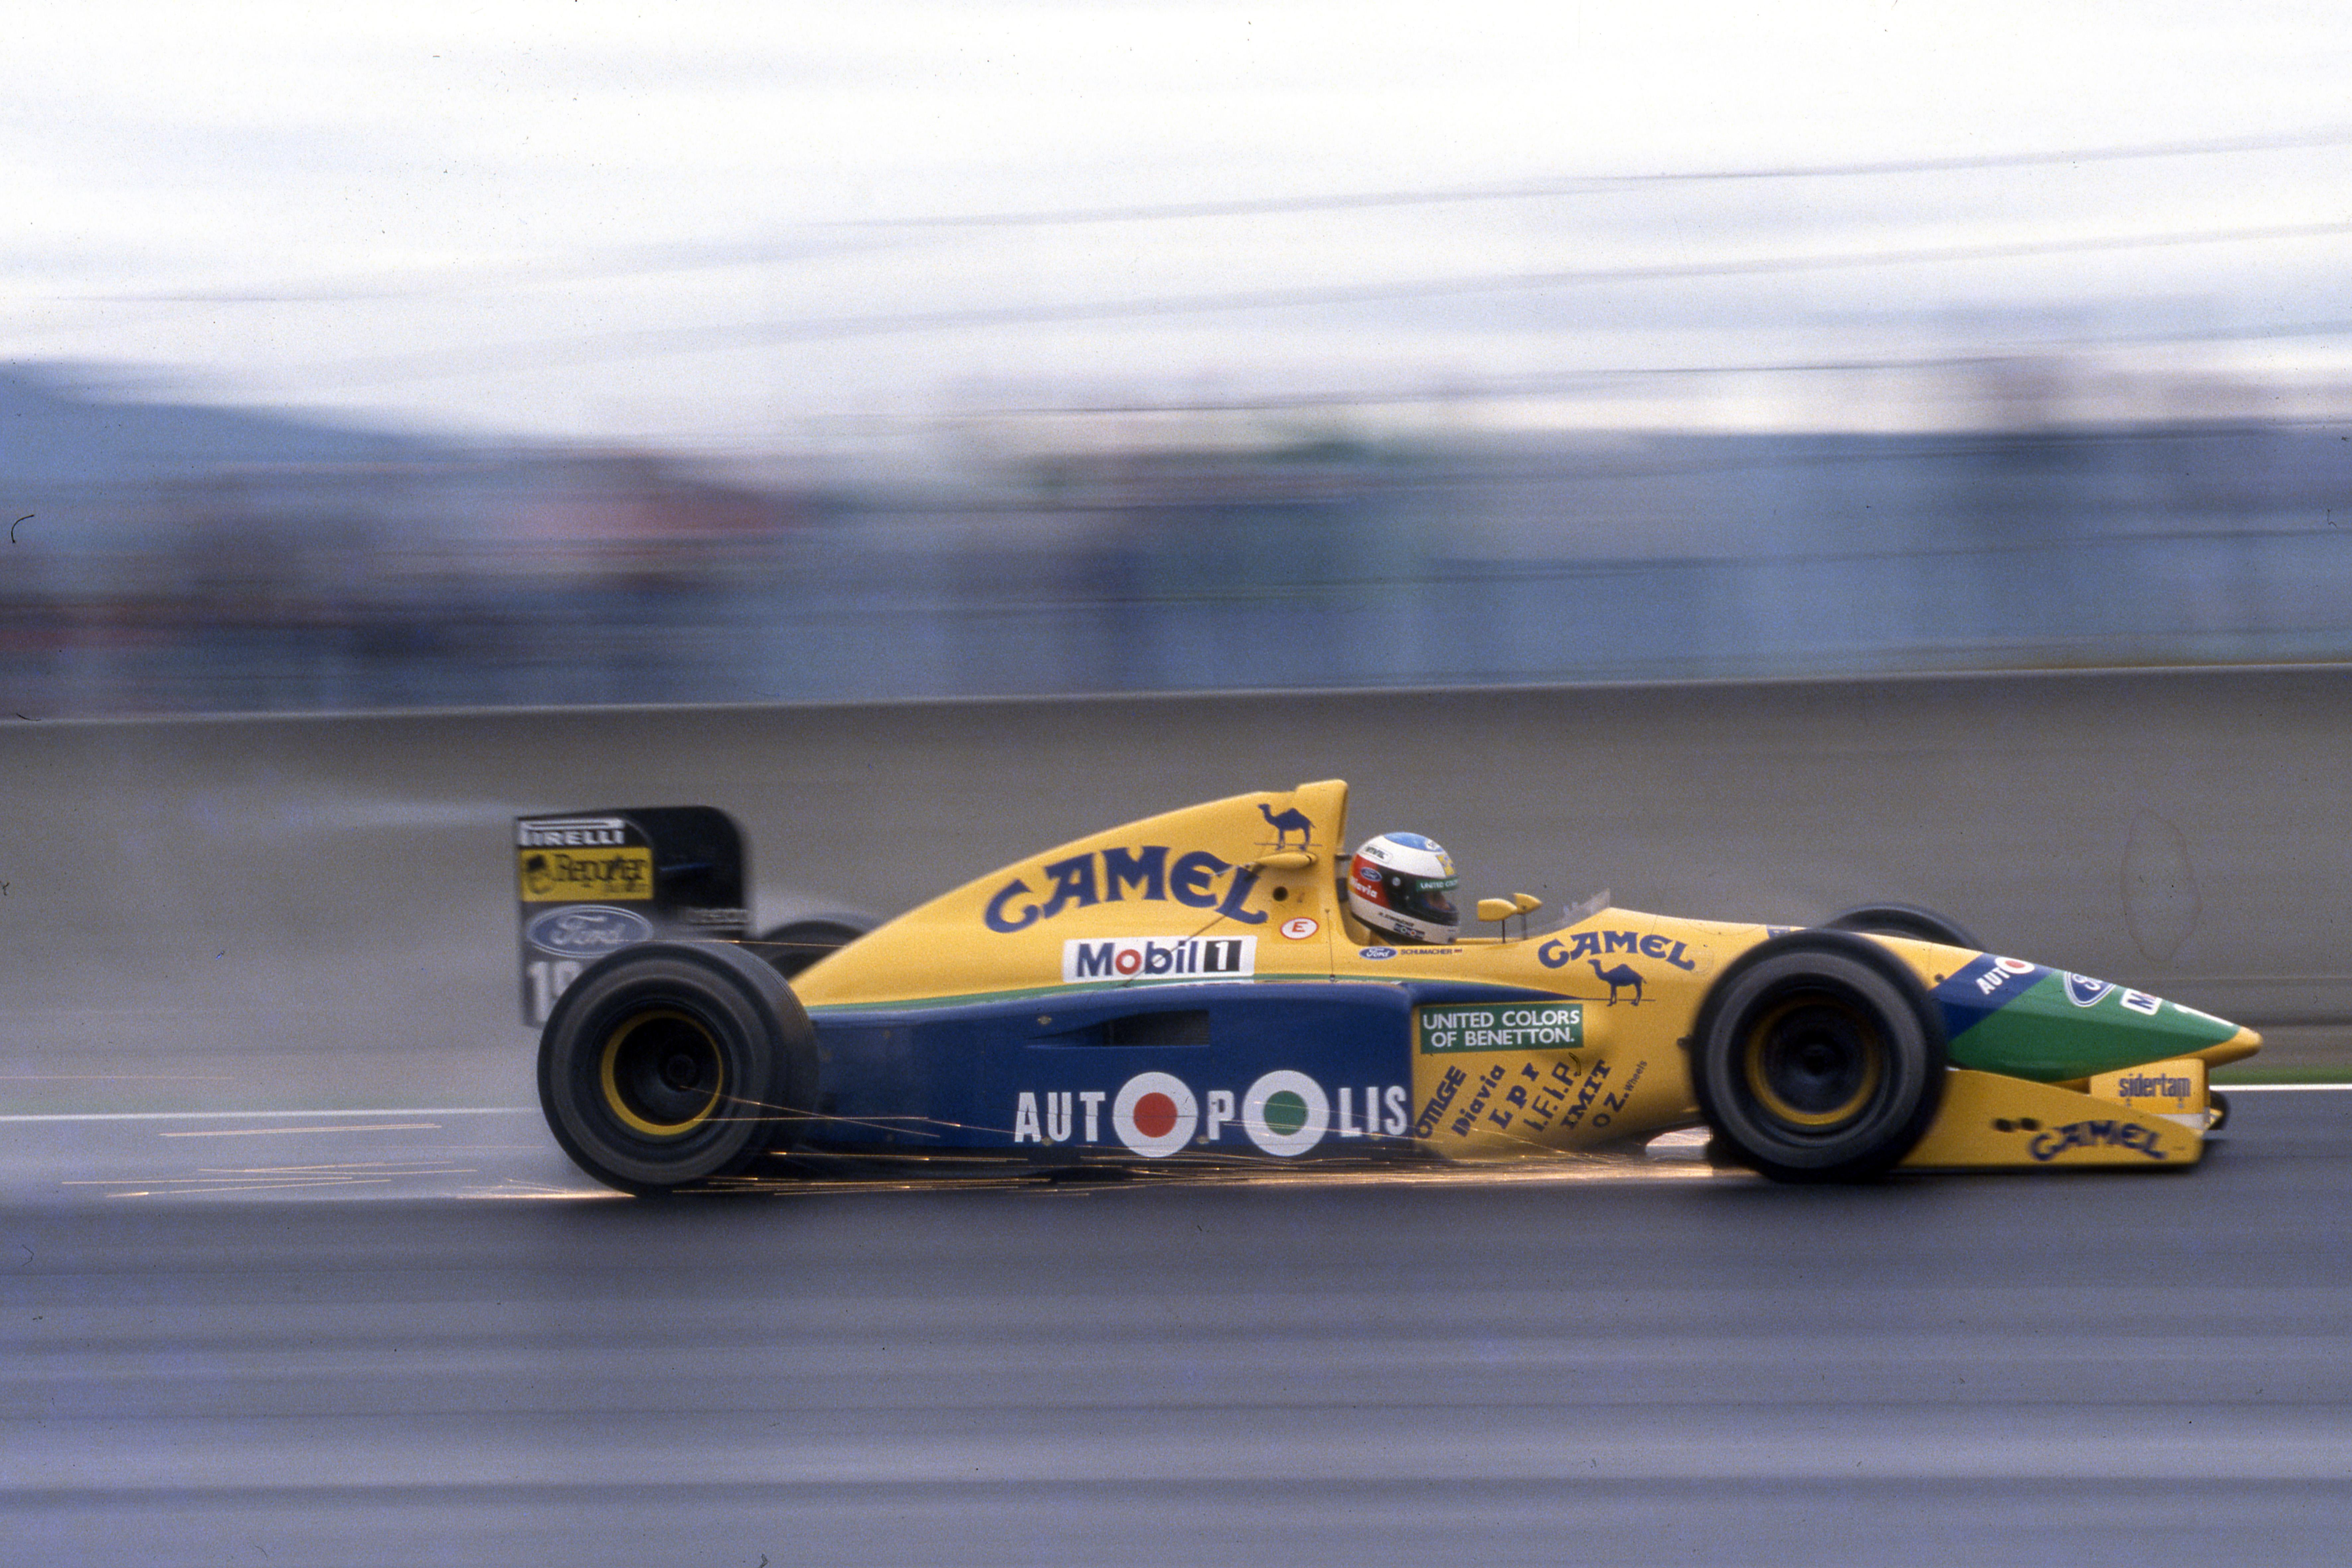 Michael Schumacher Benetton Spanish Grand Prix 1991 Barcelona